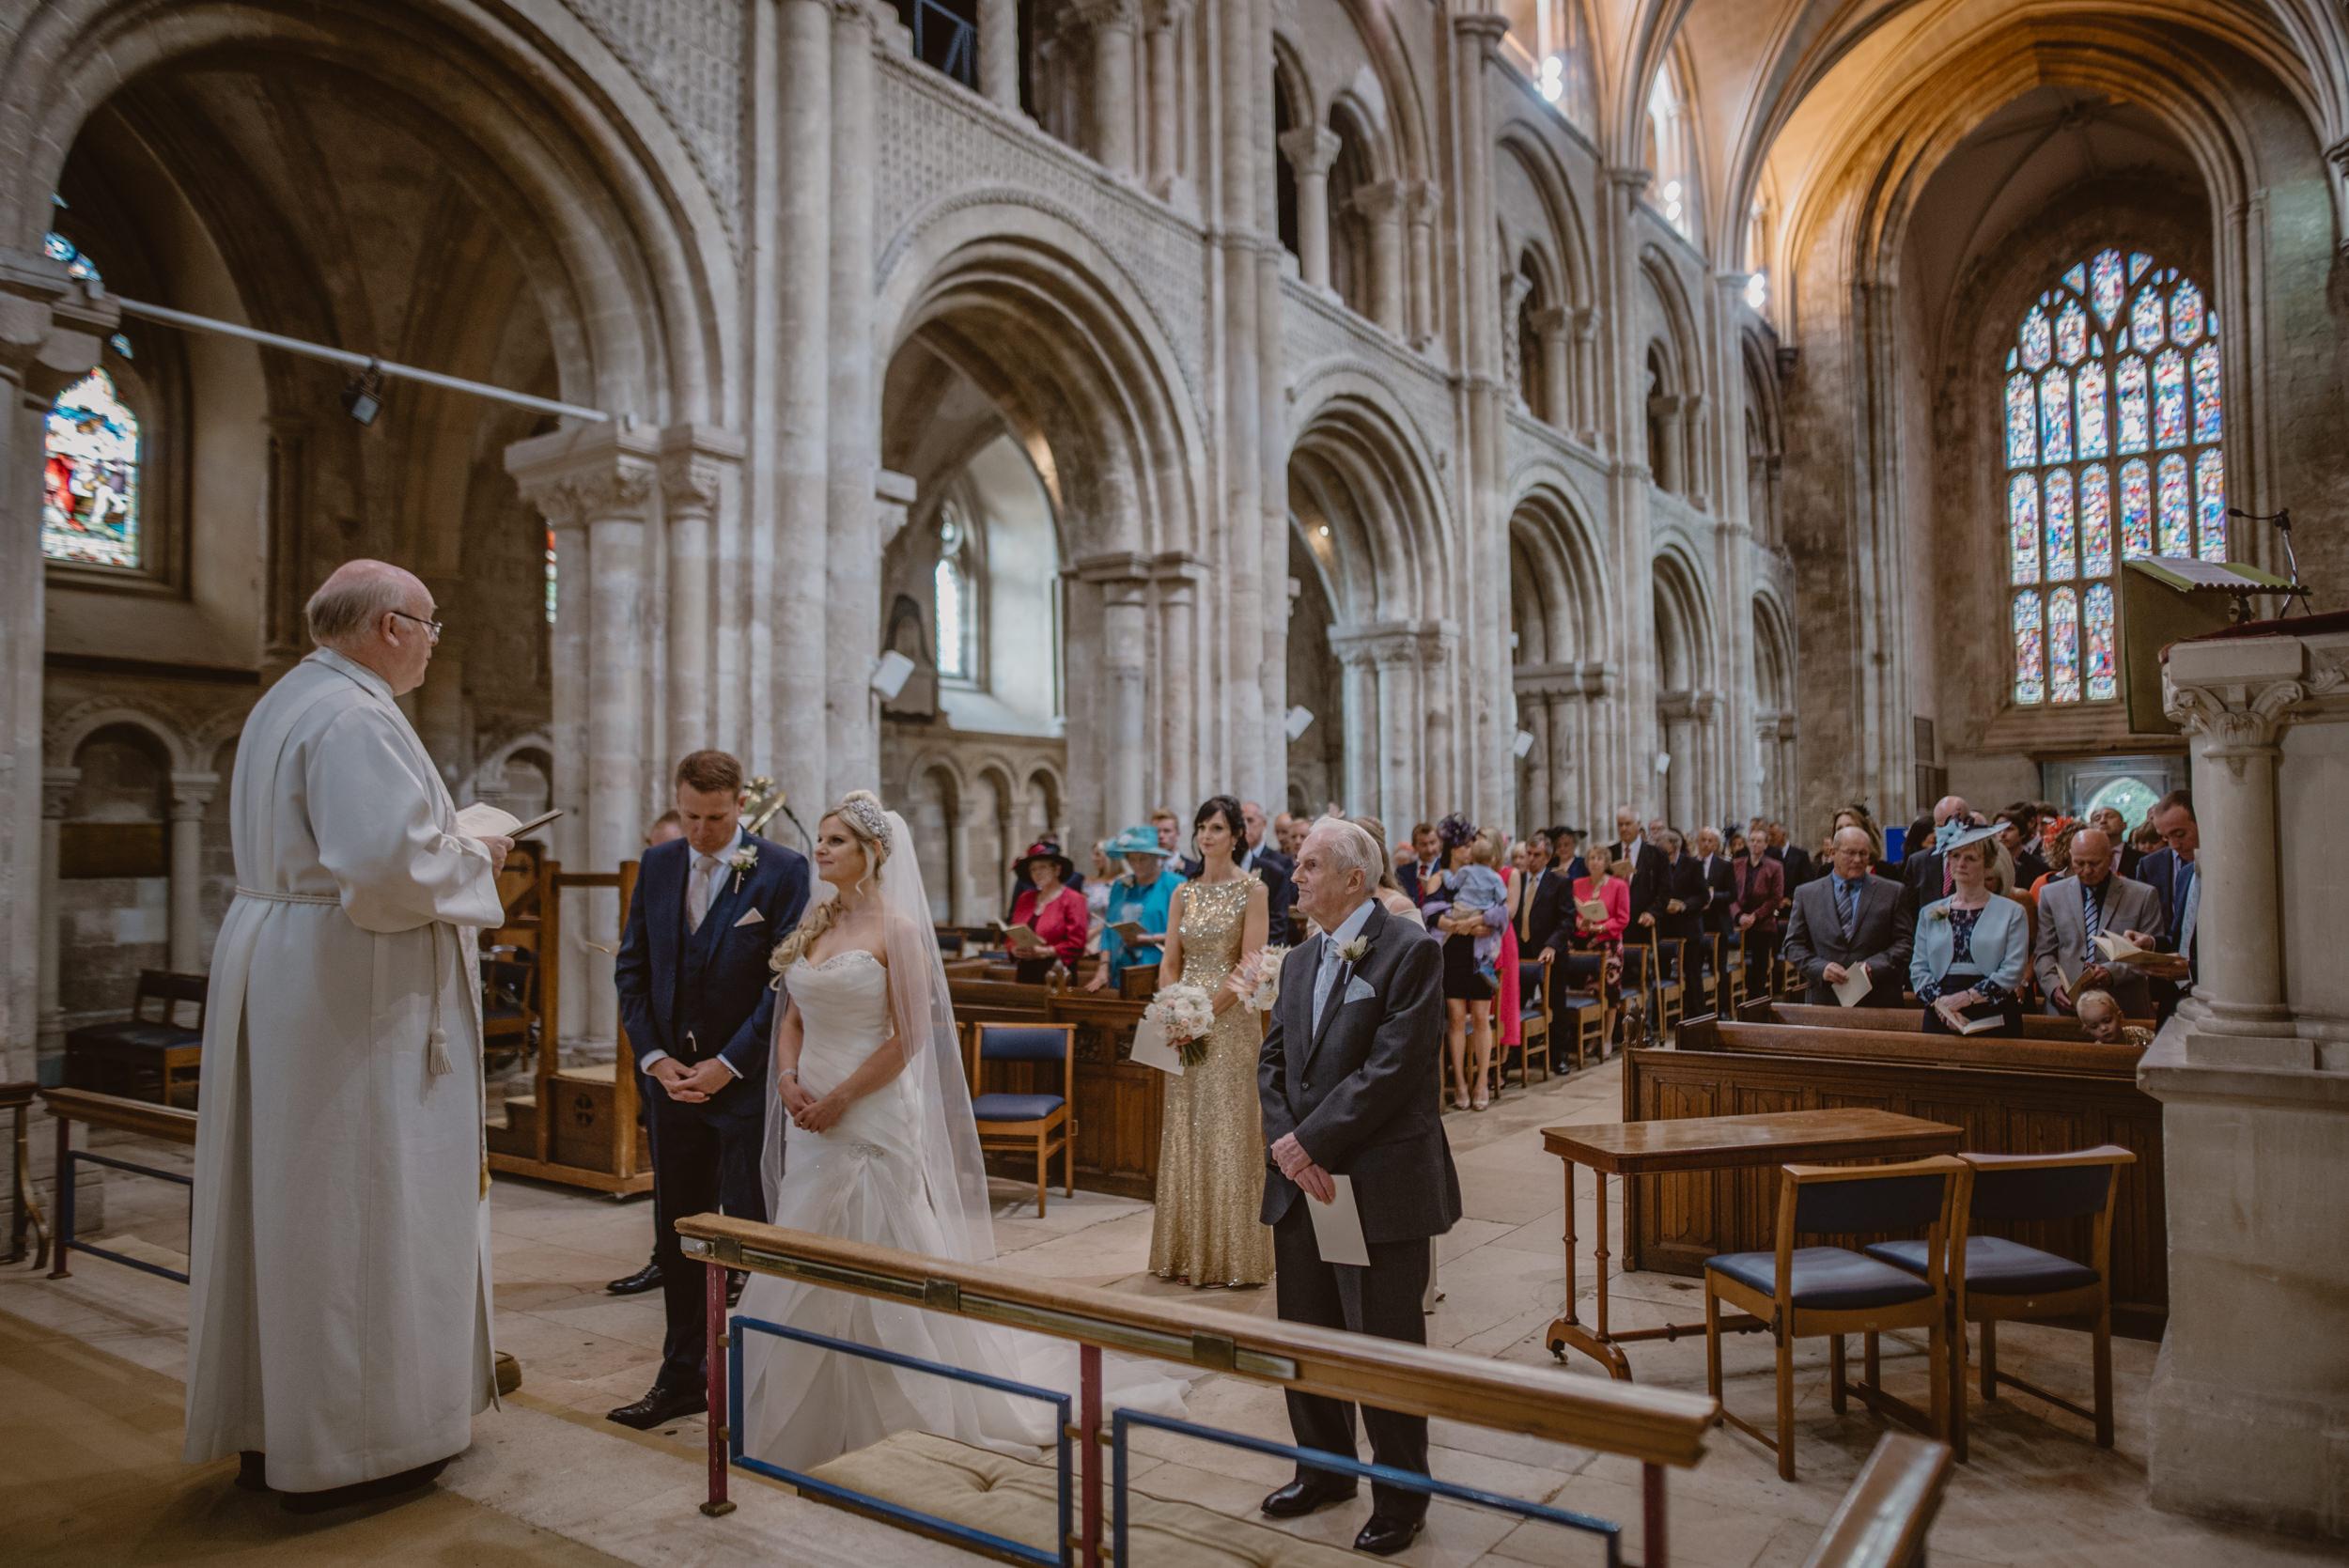 Trisha-and-Roger-wedding-The-Priory-Church-and-Chewton-Glen-Hotel-Christchurch-Manu-Mendoza-Wedding-Photography-138.jpg